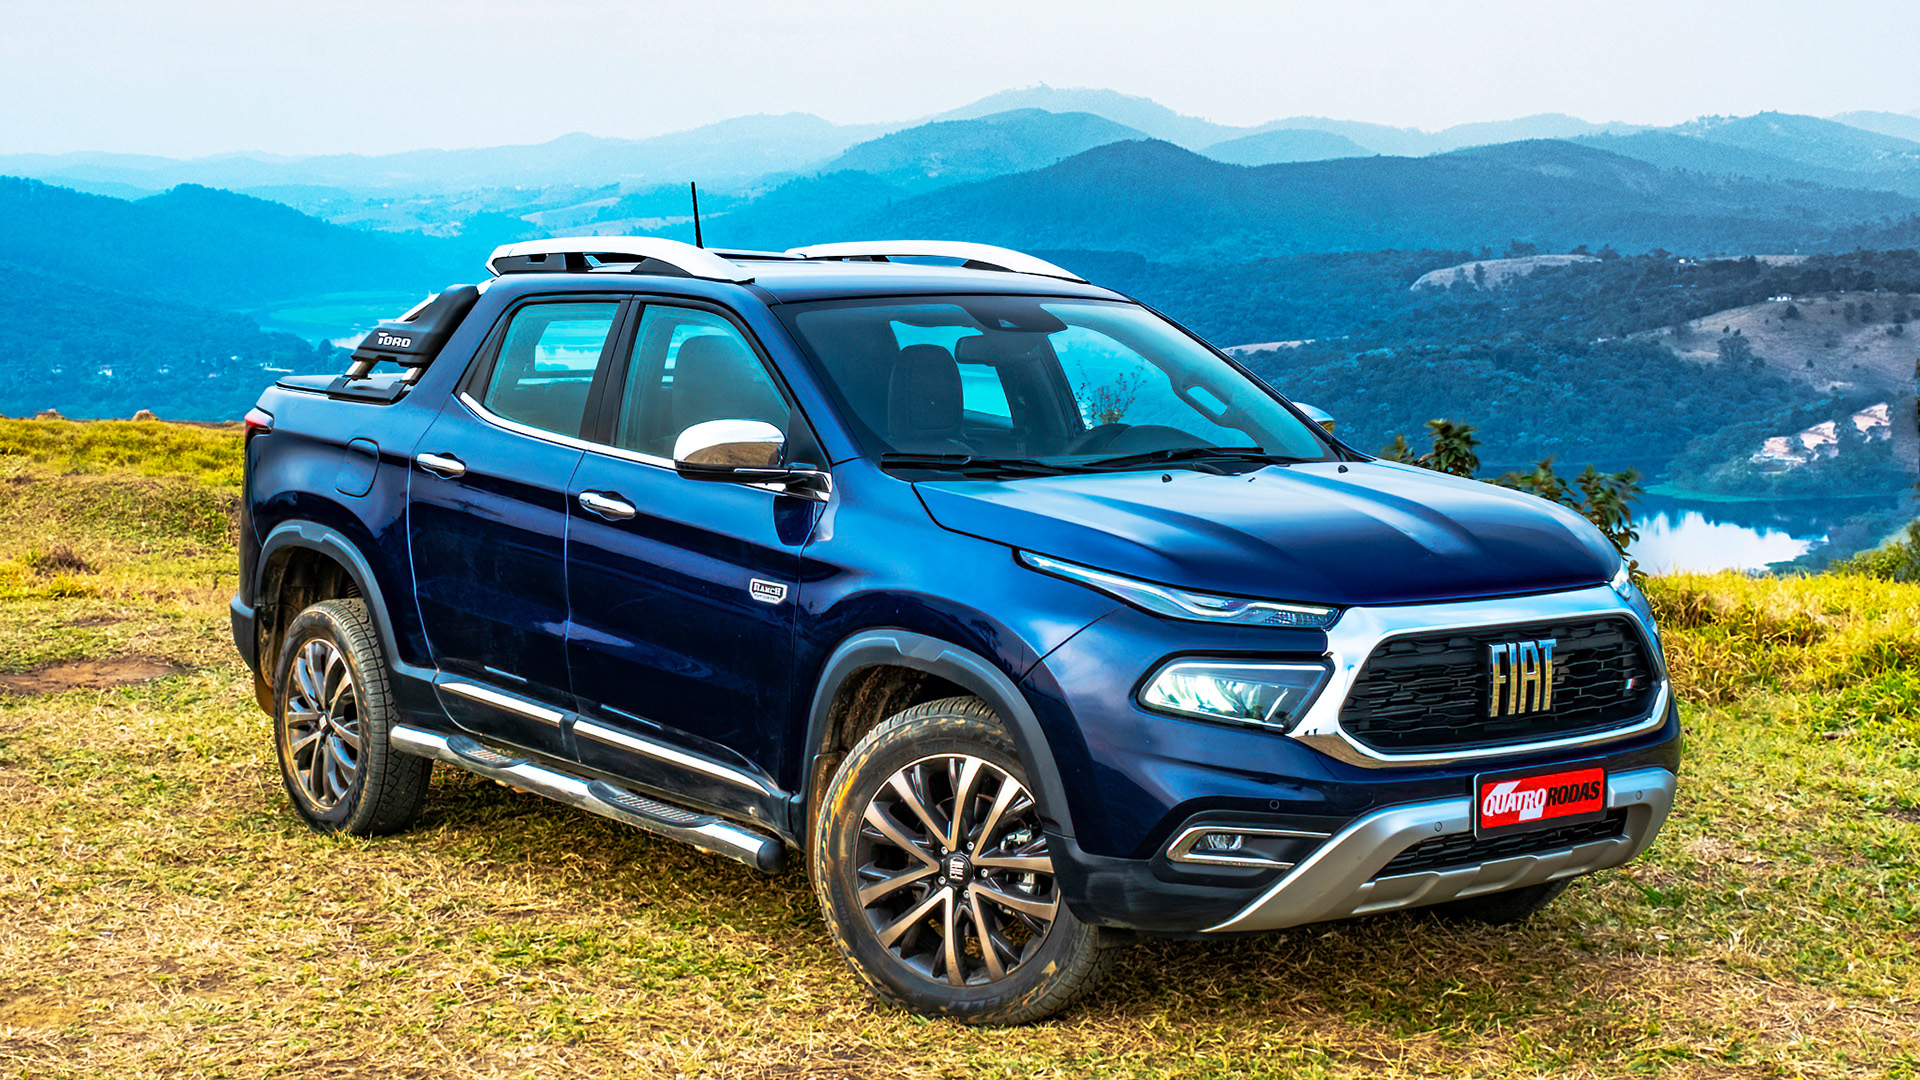 Fiat Toro Ranch Diesel testada por QUATRO RODAS